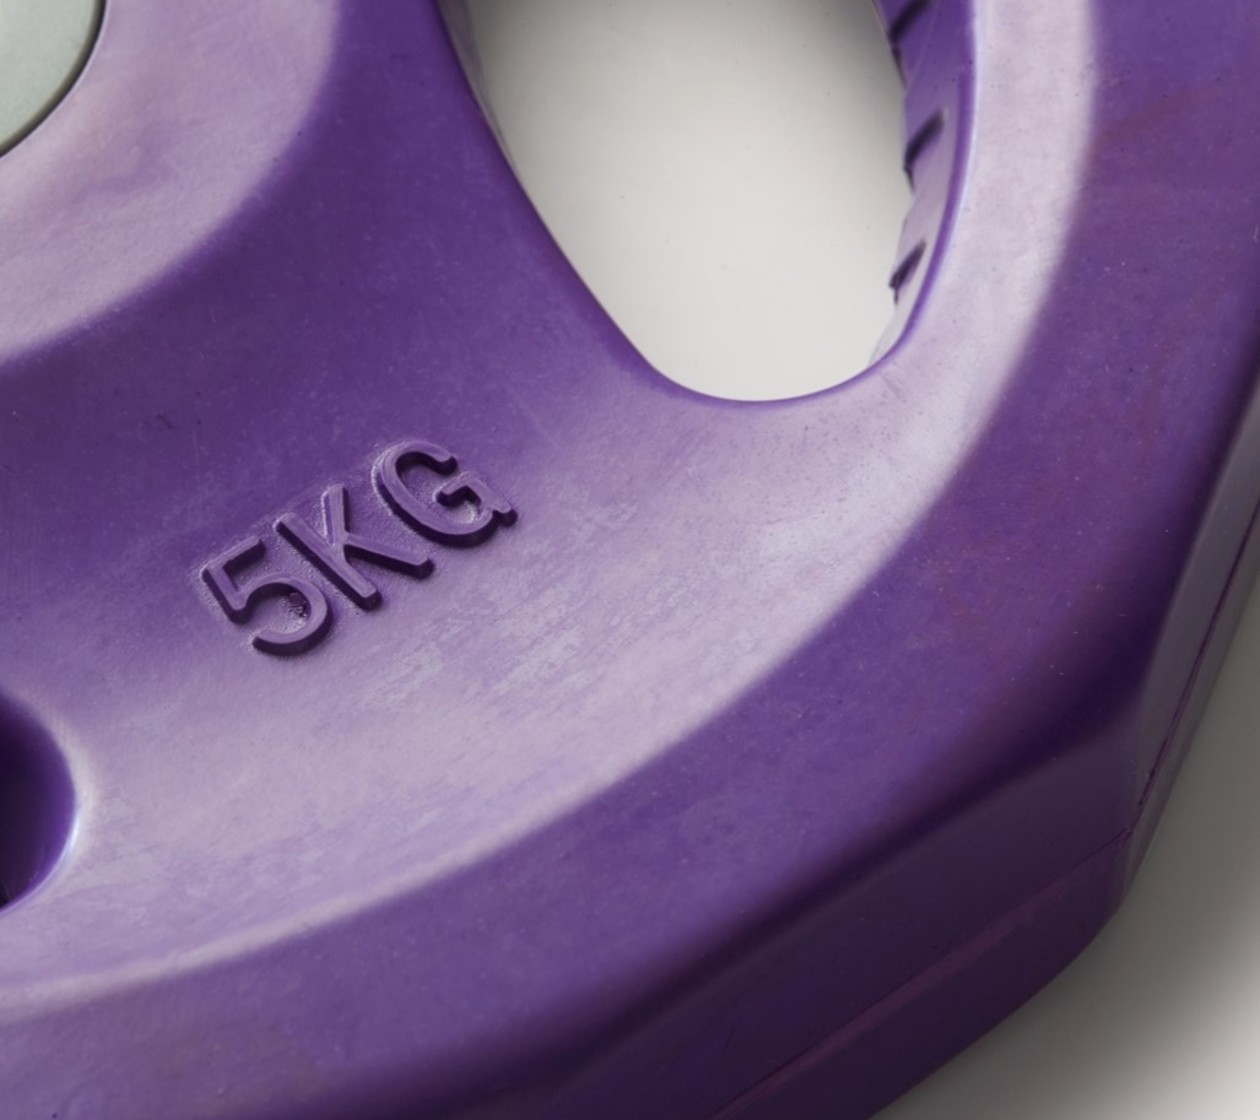 Aerobic schijf - 2x5kg